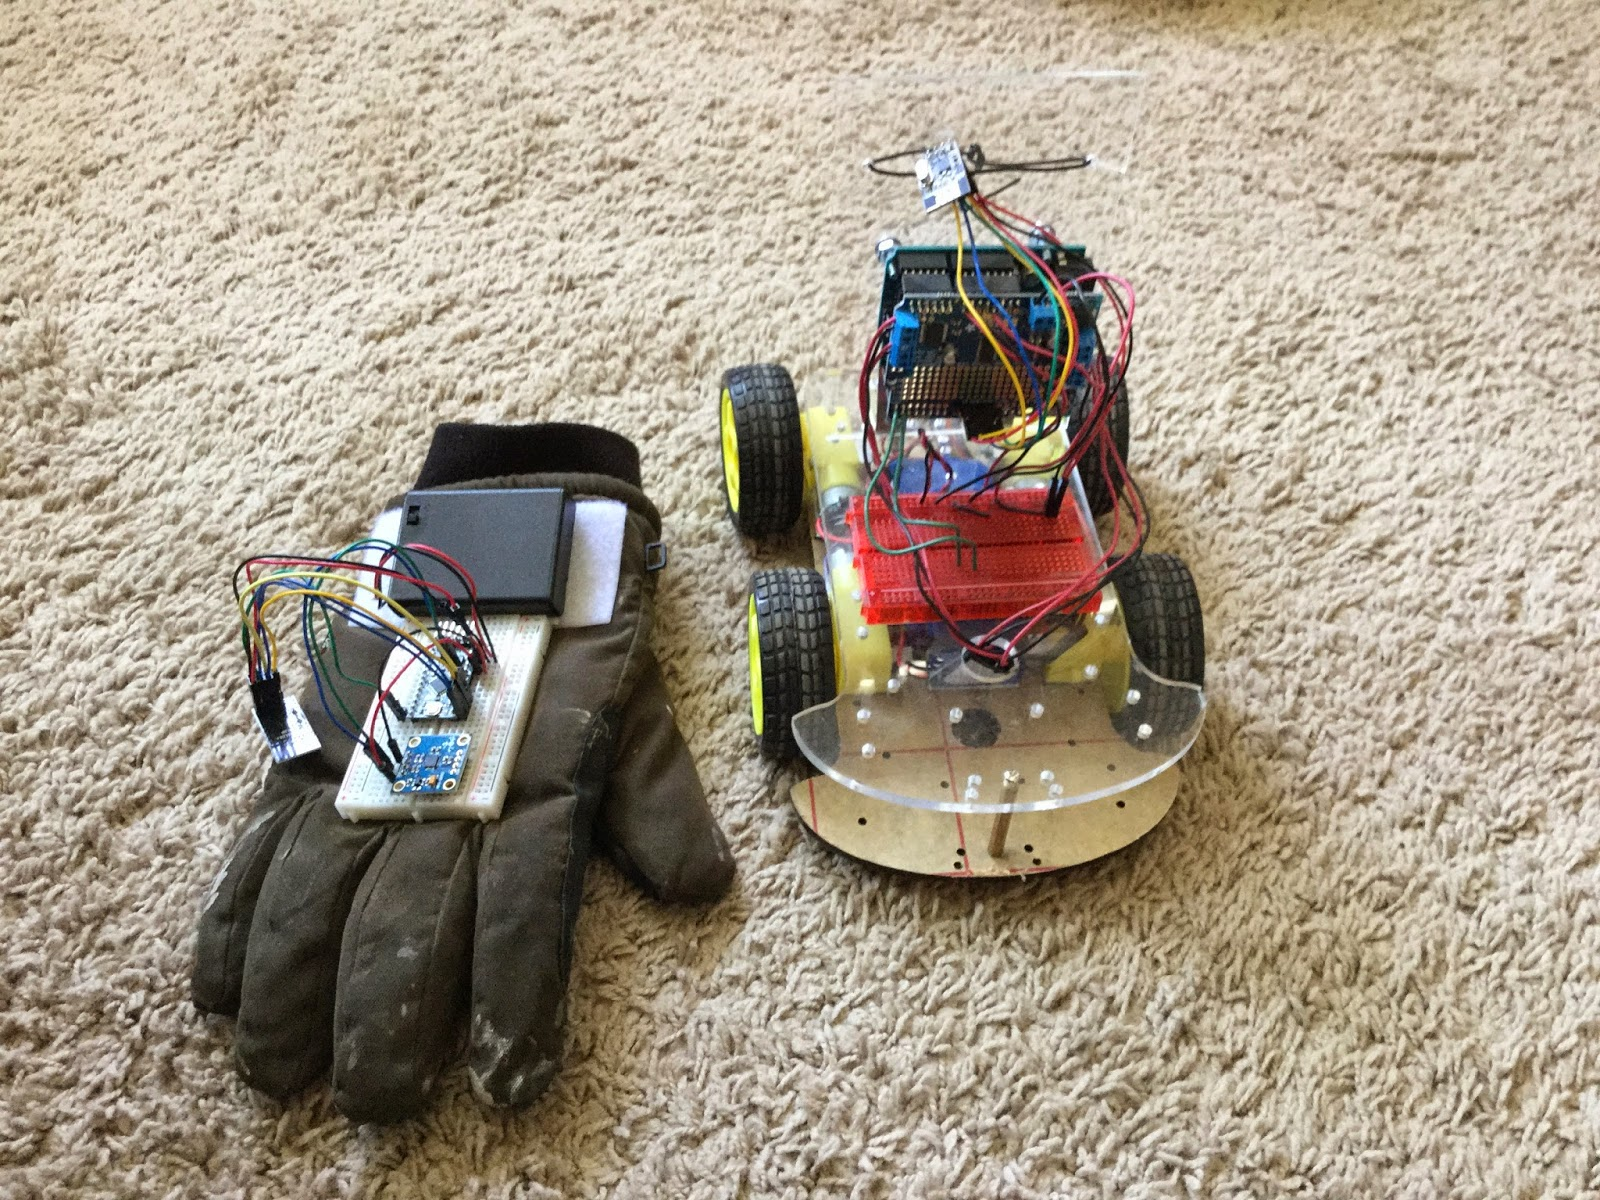 ForceTronics: nRF24L01 / Accelerometer RC Car